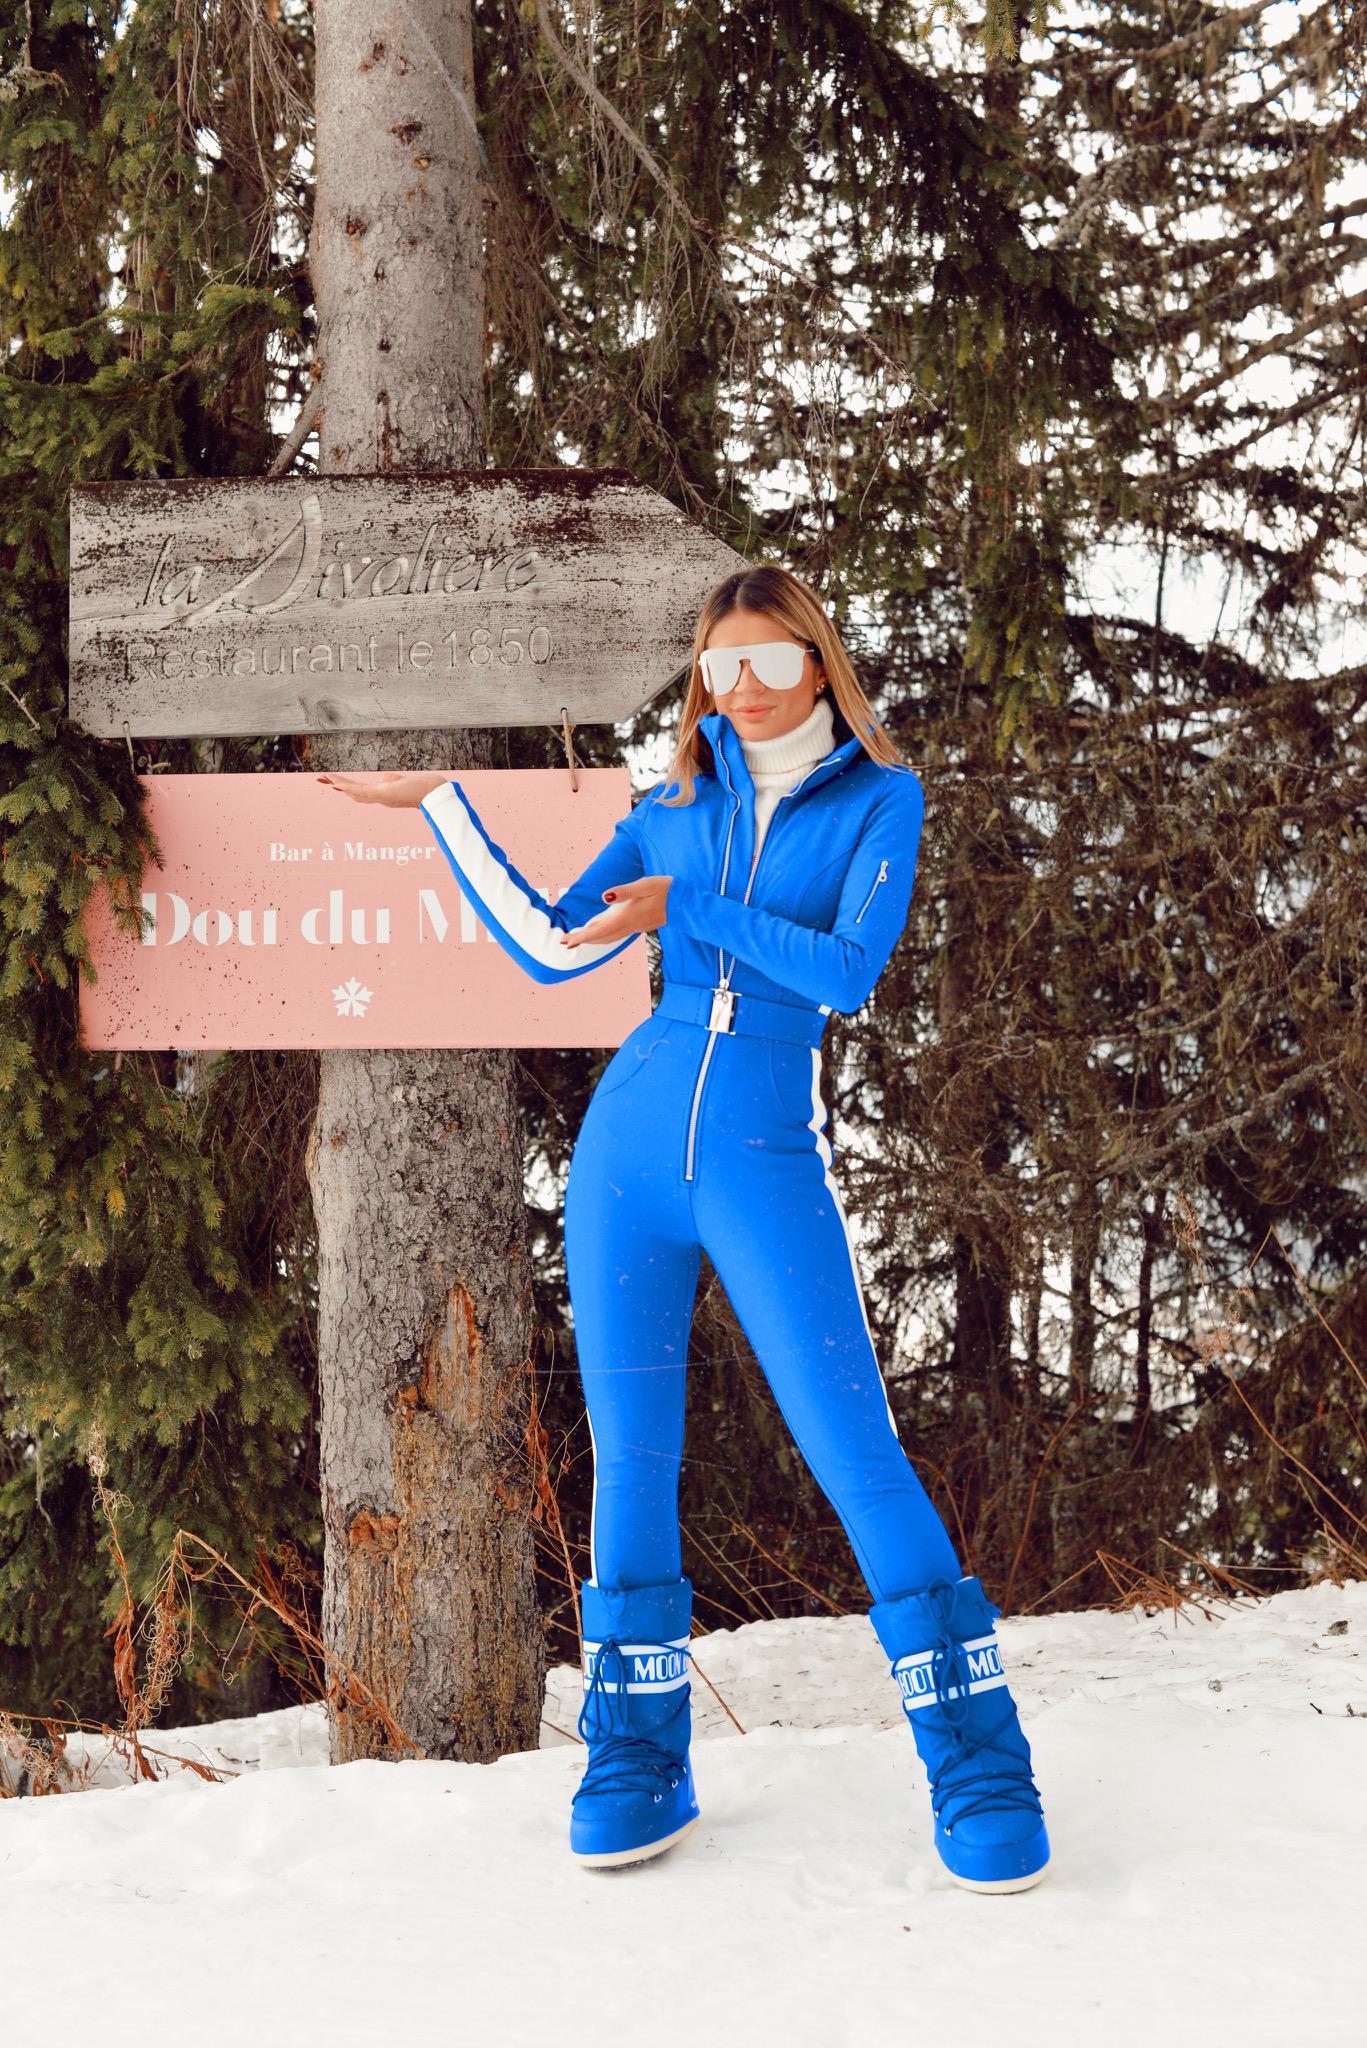 Thássia esqui couchevel